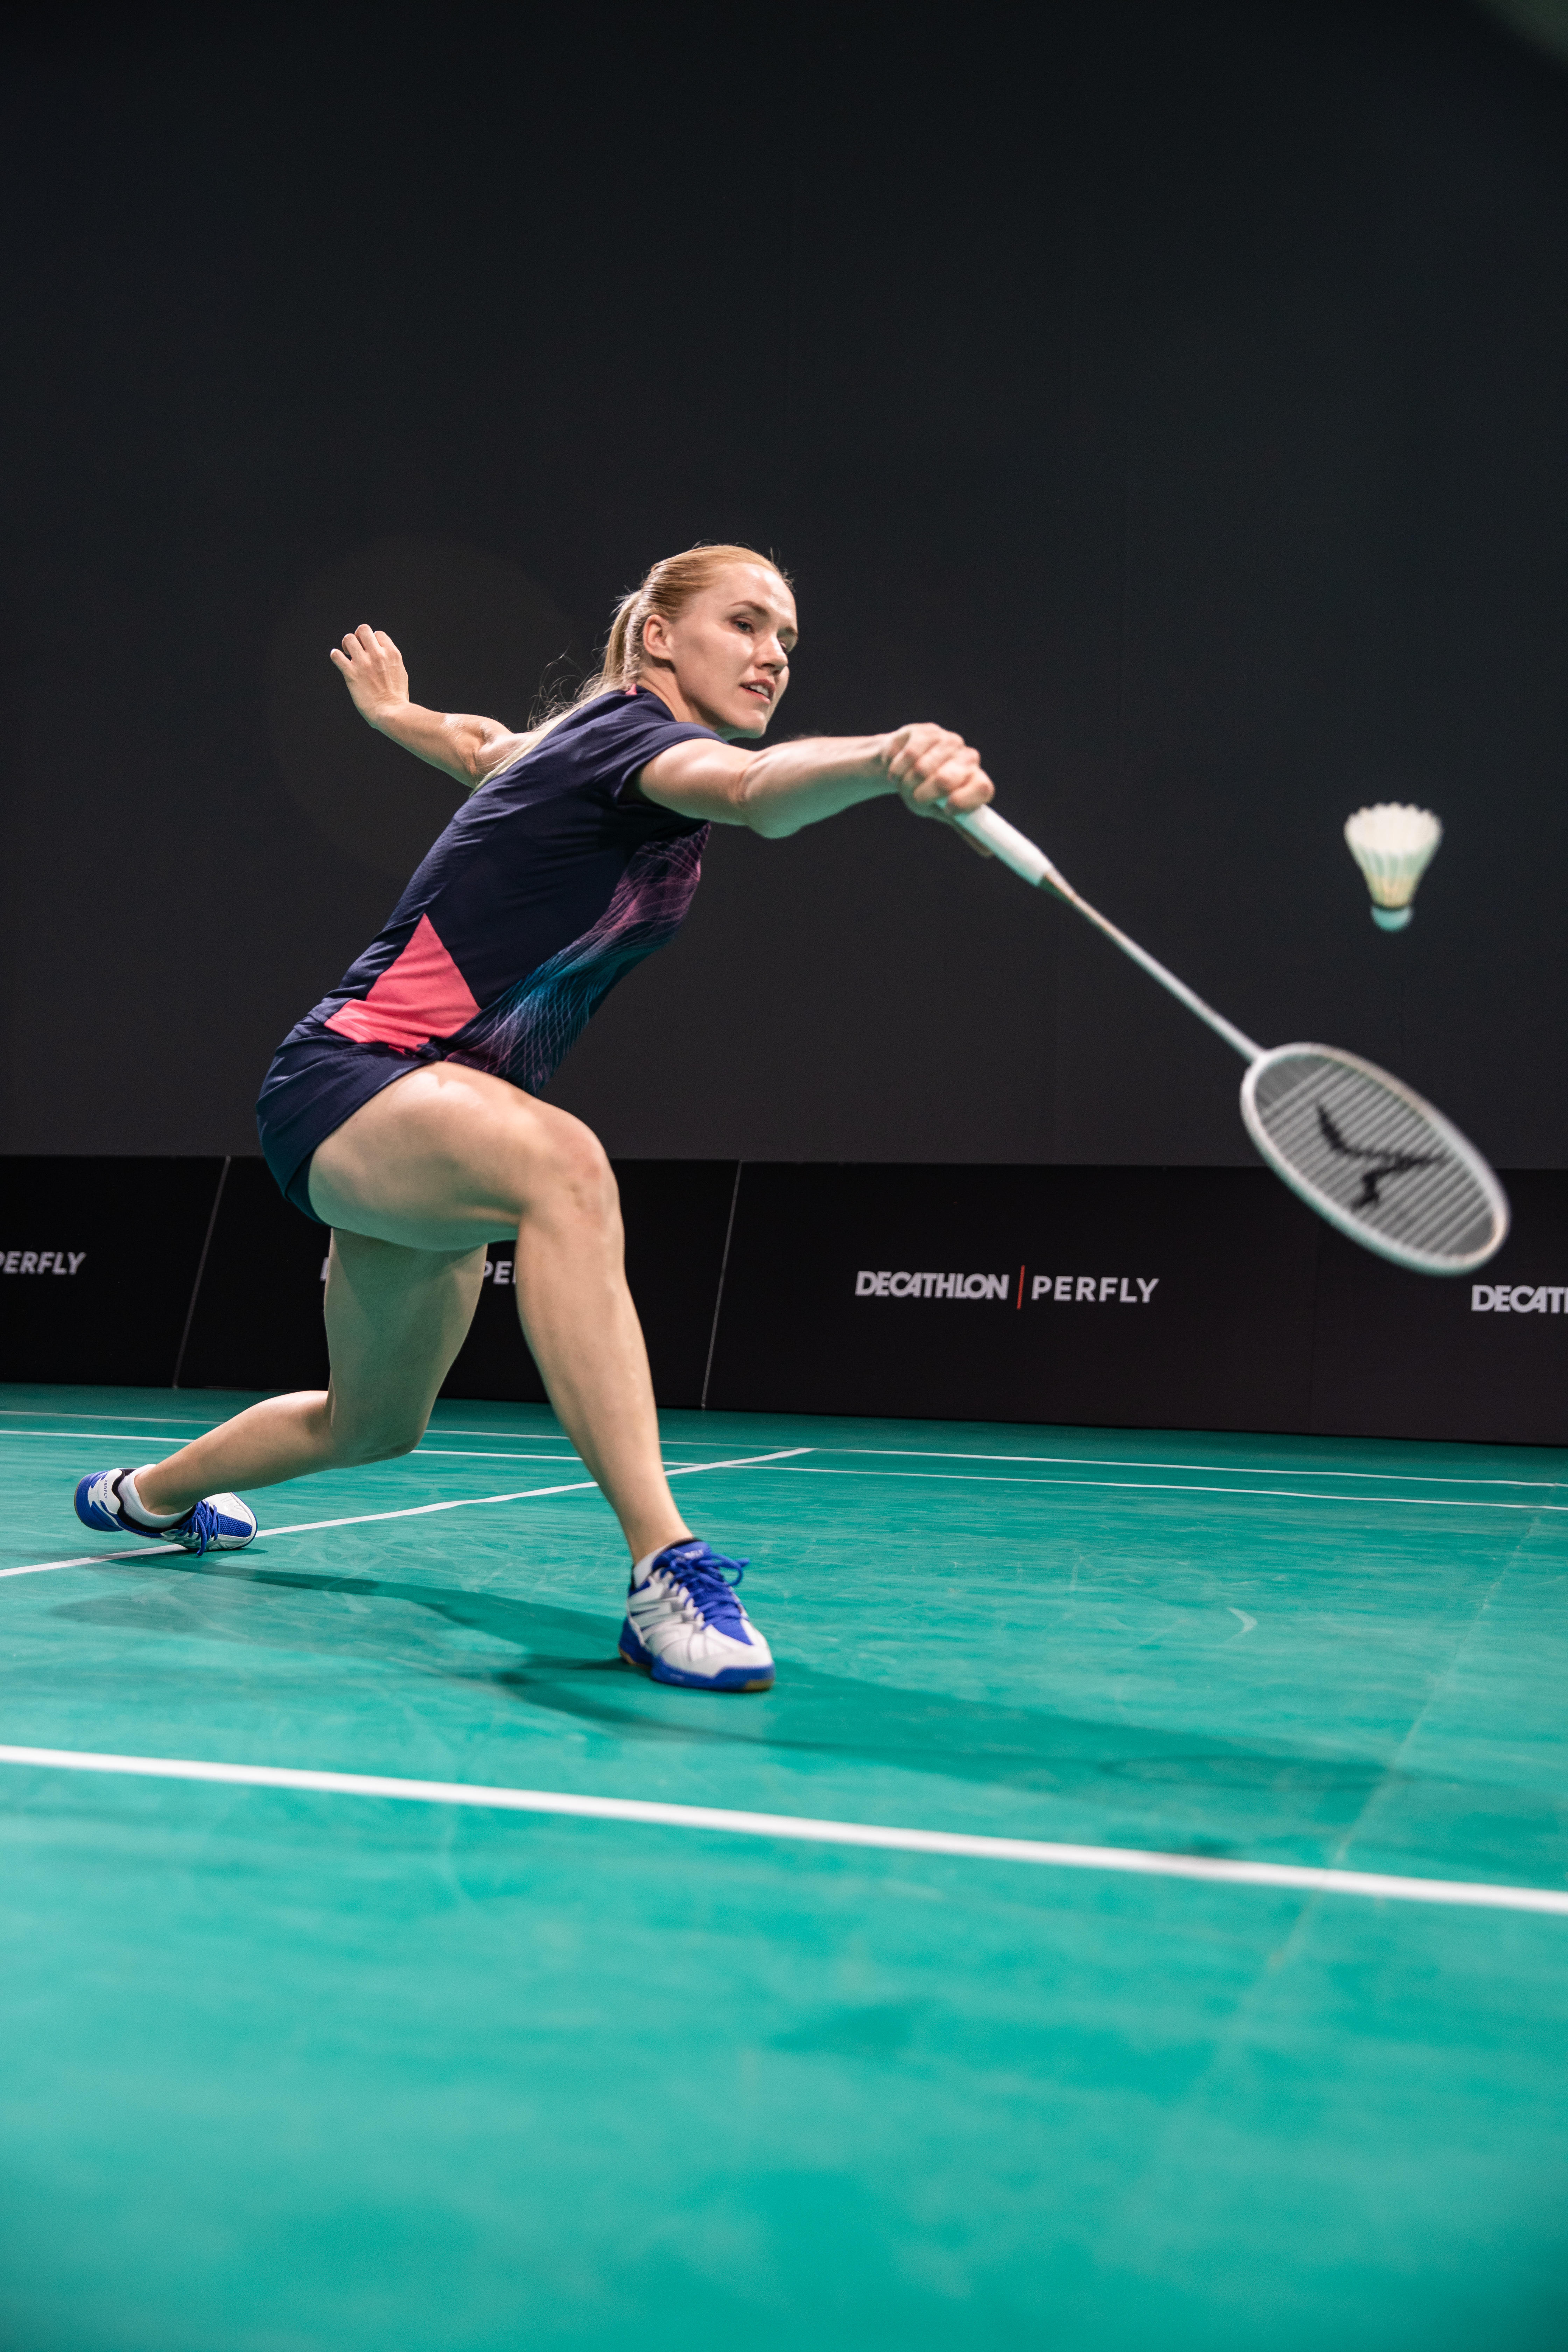 backhand smash in badminton